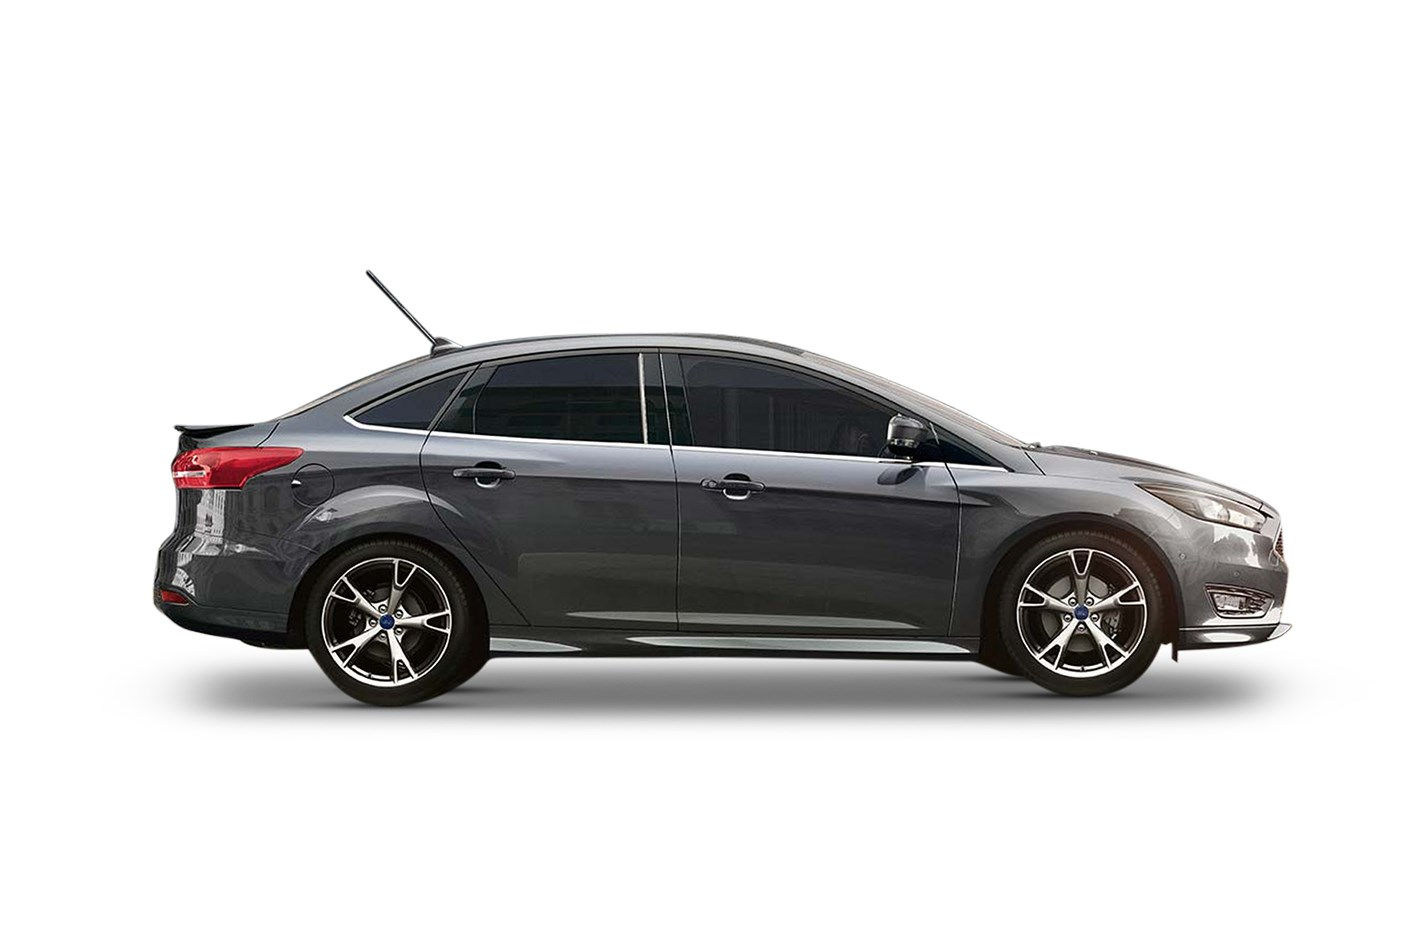 2018 ford focus titanium 1 5l 4cyl petrol turbocharged automatic sedan